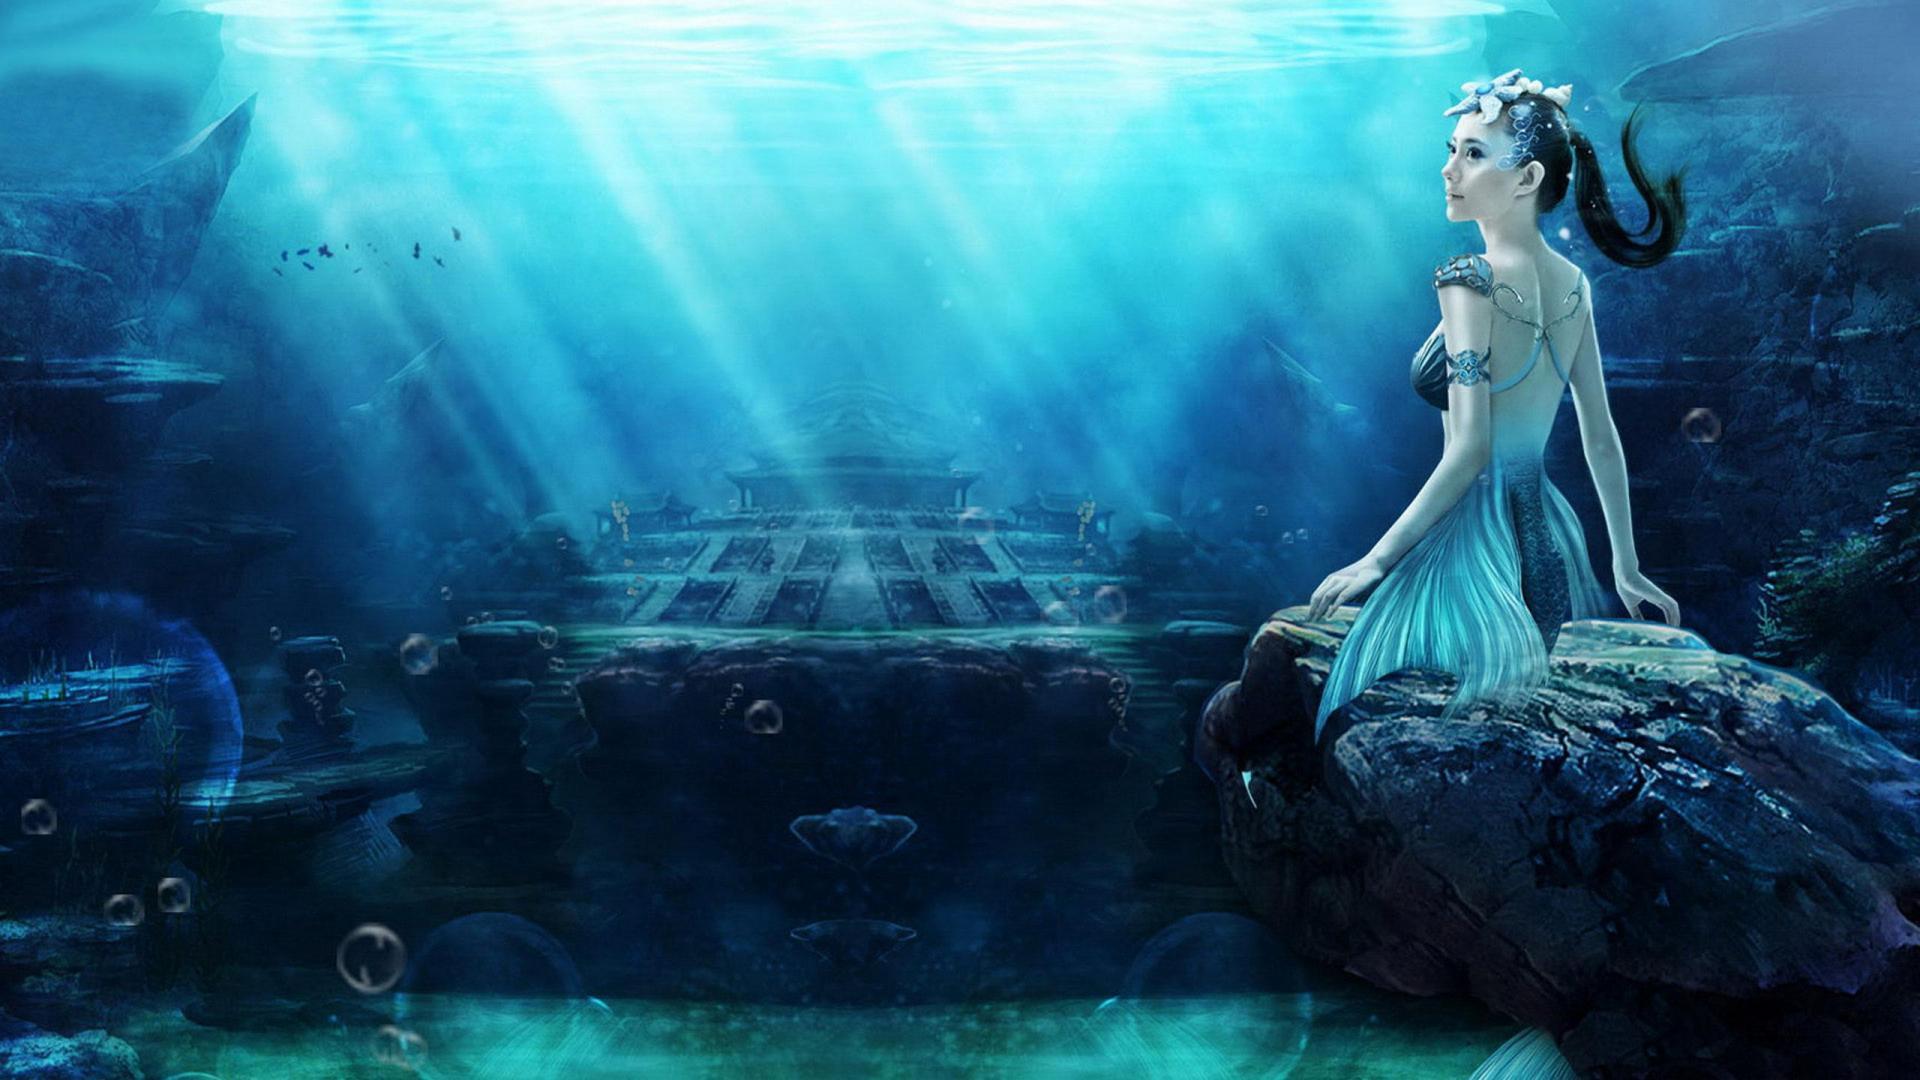 Gallery For The Little Mermaid Wallpaper Desktop Little Mermaid 1920x1080